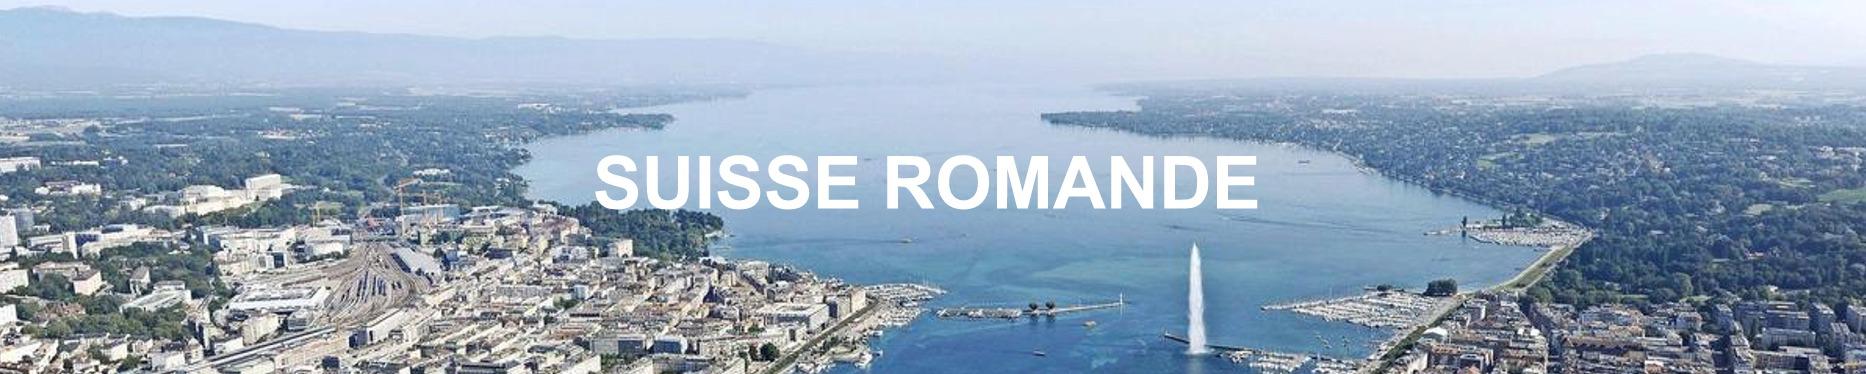 evolution prix immobilier suisse romande 2020